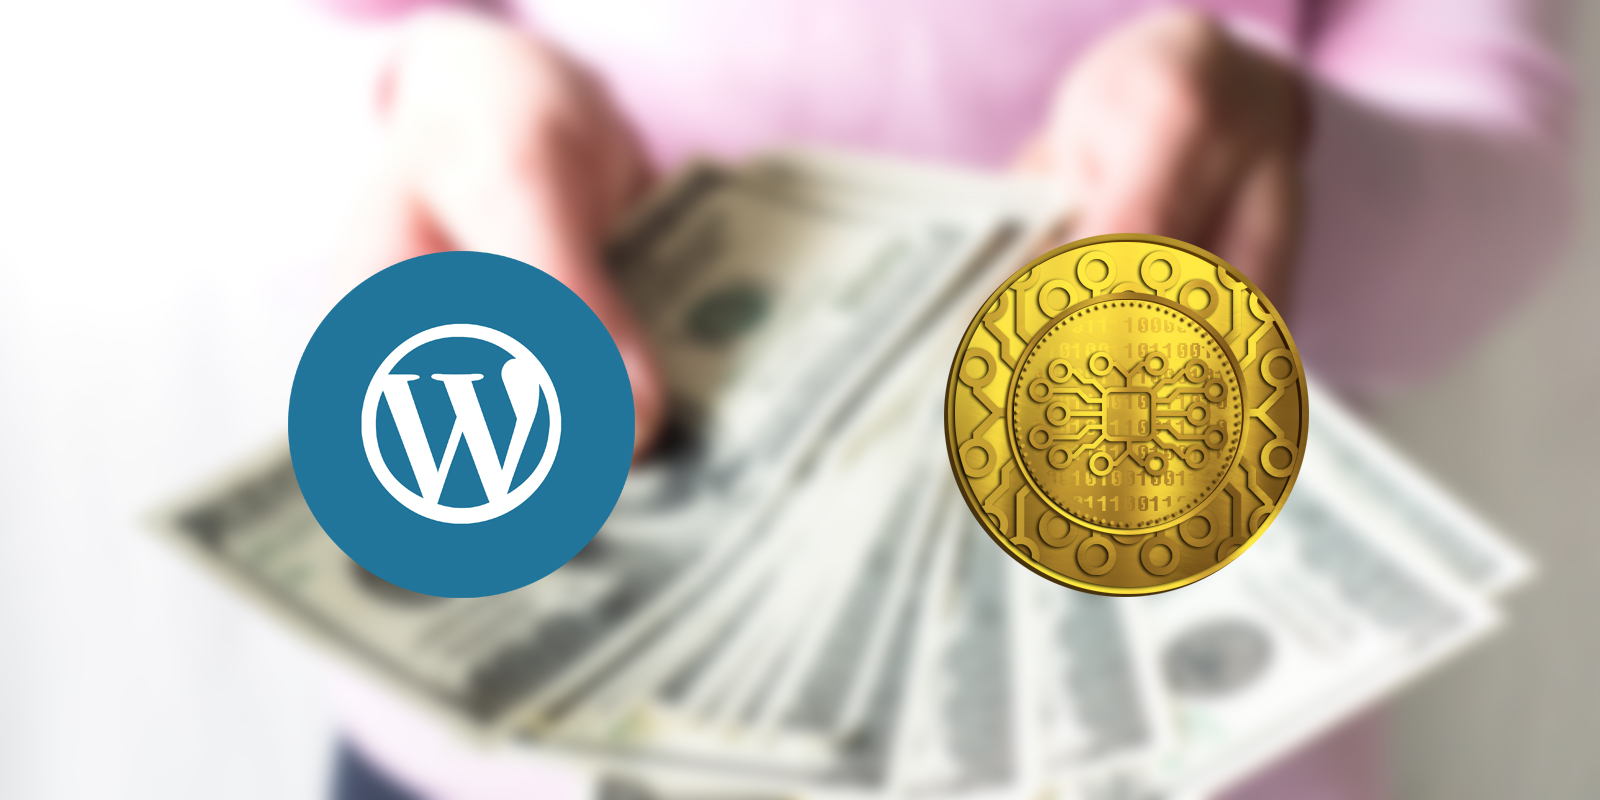 wordpress eklentisi ile kripto para oluşturulacak